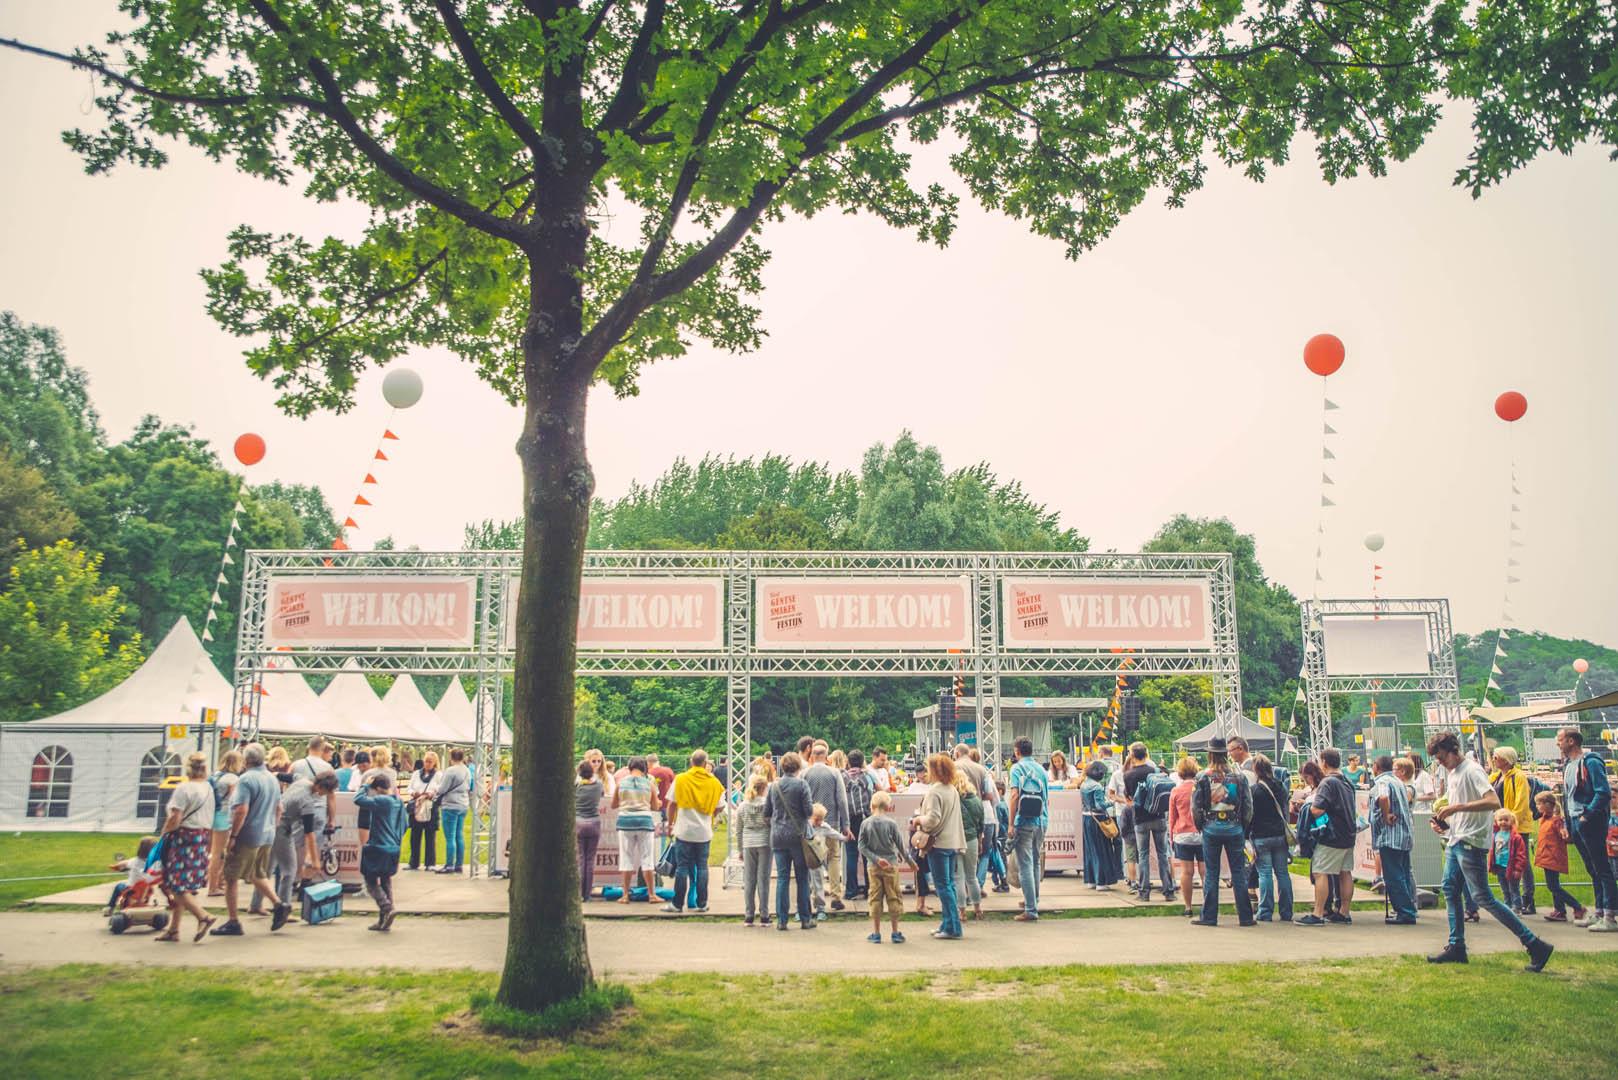 Stad Gent Picknick Event